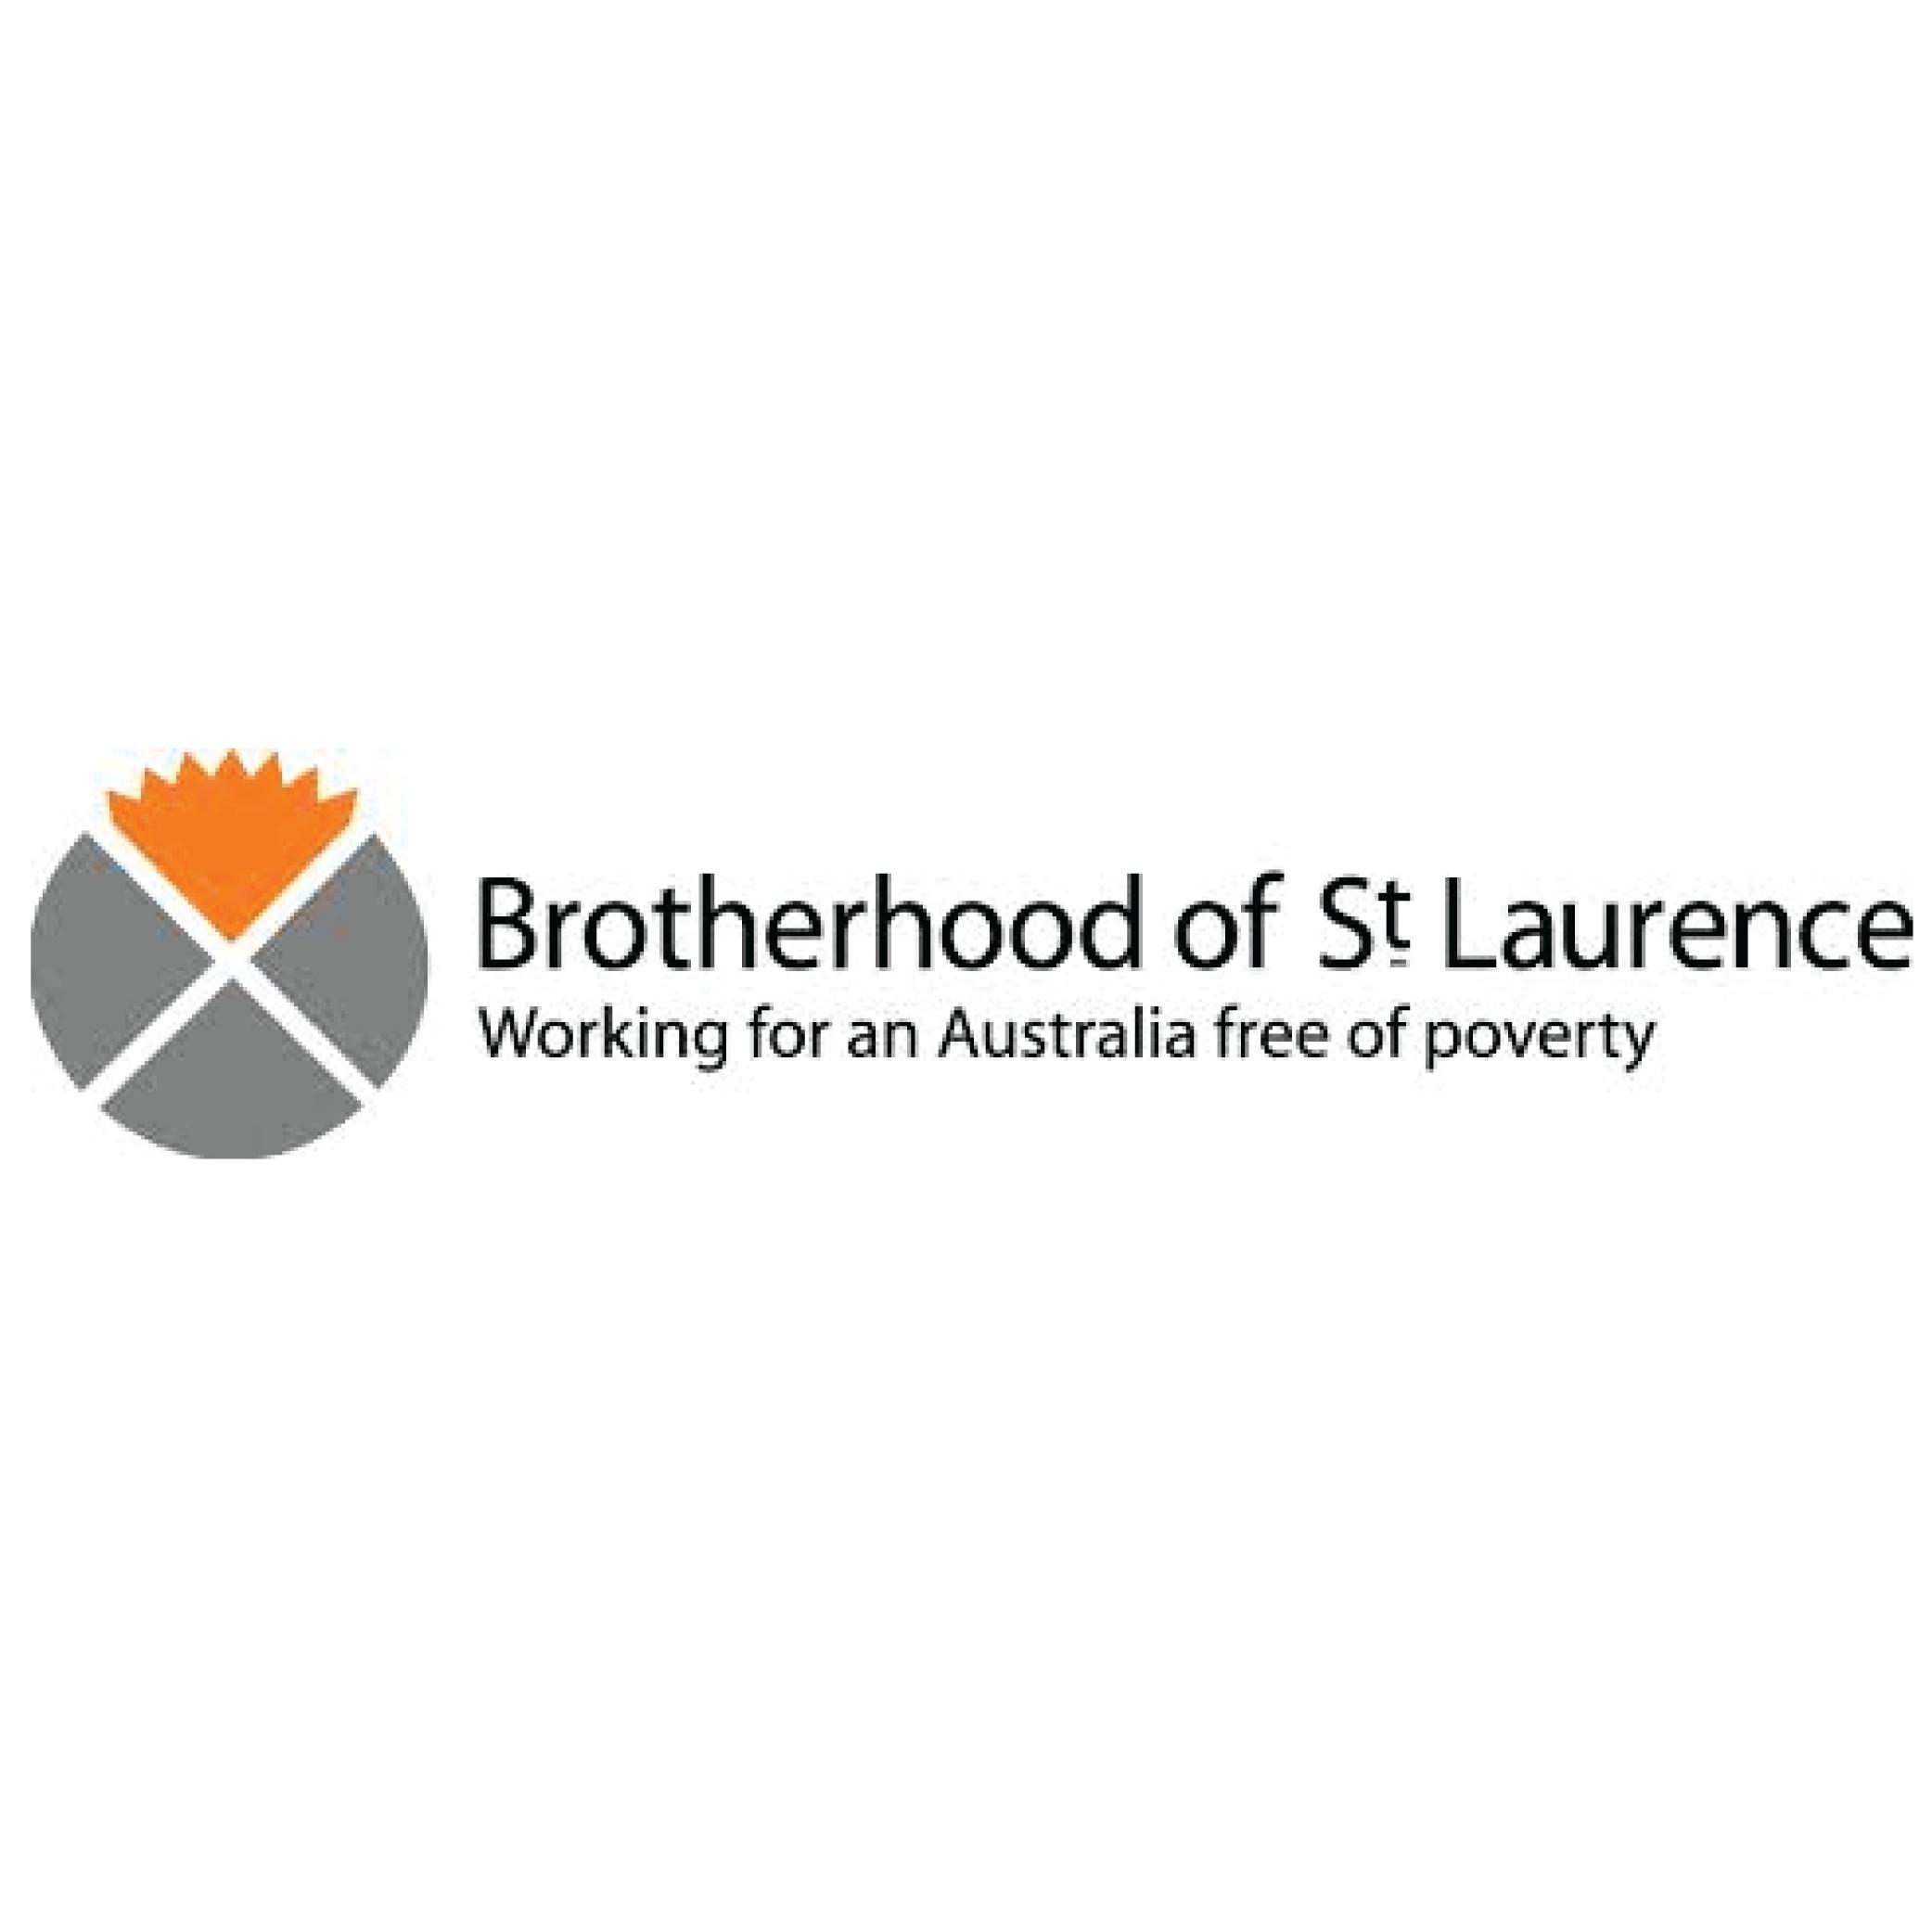 Brotherhood of St Laurence-01-01.png